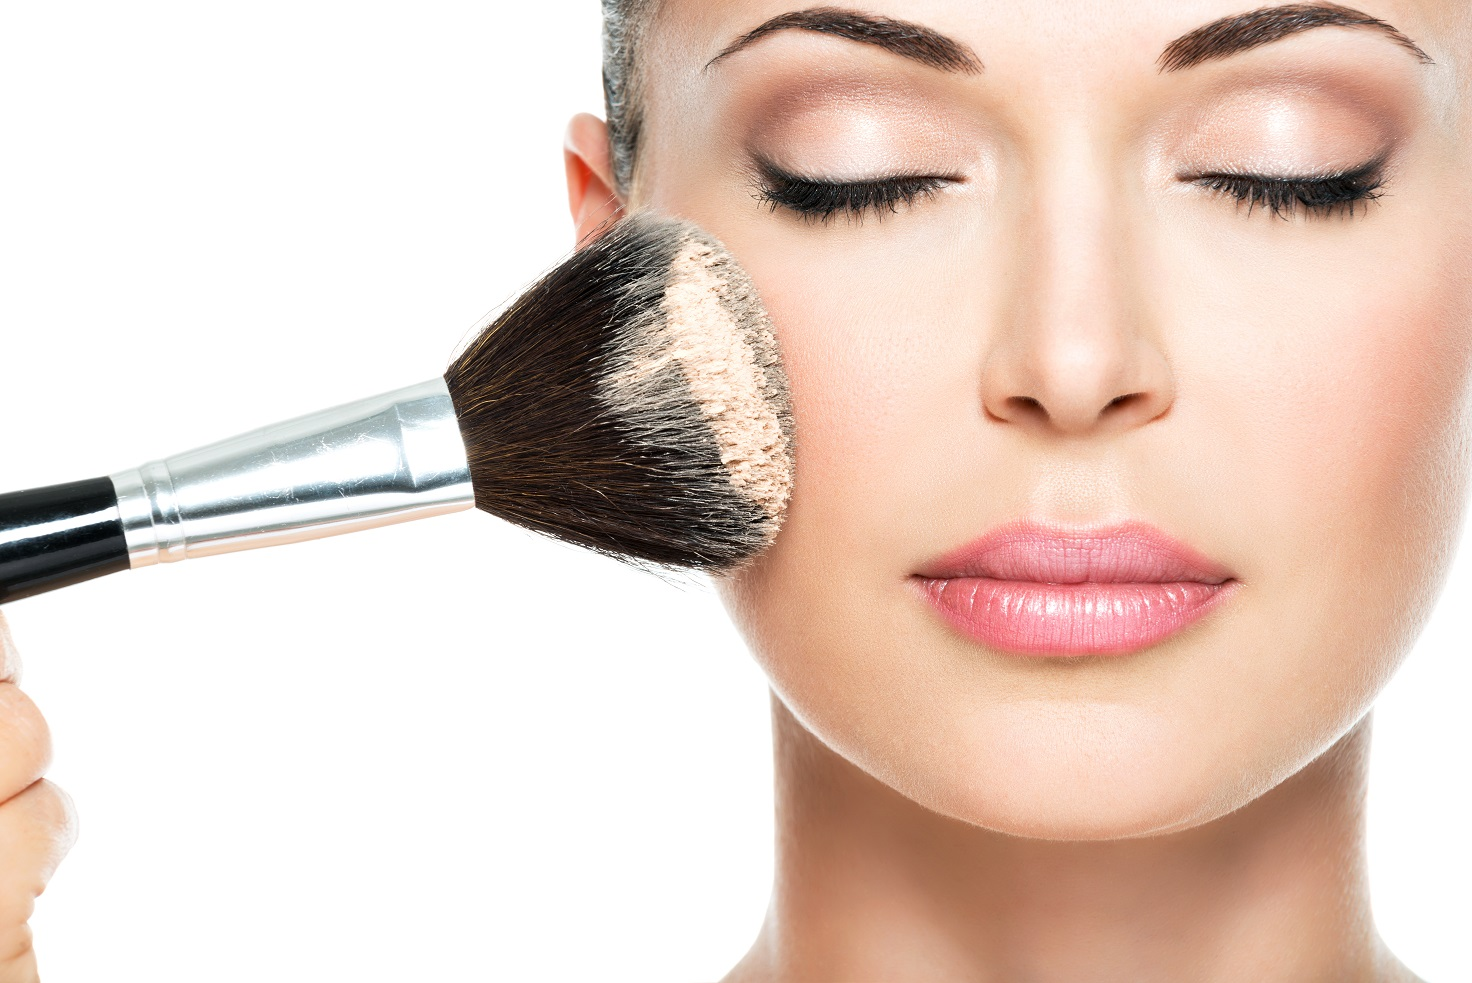 Image result for make up girl